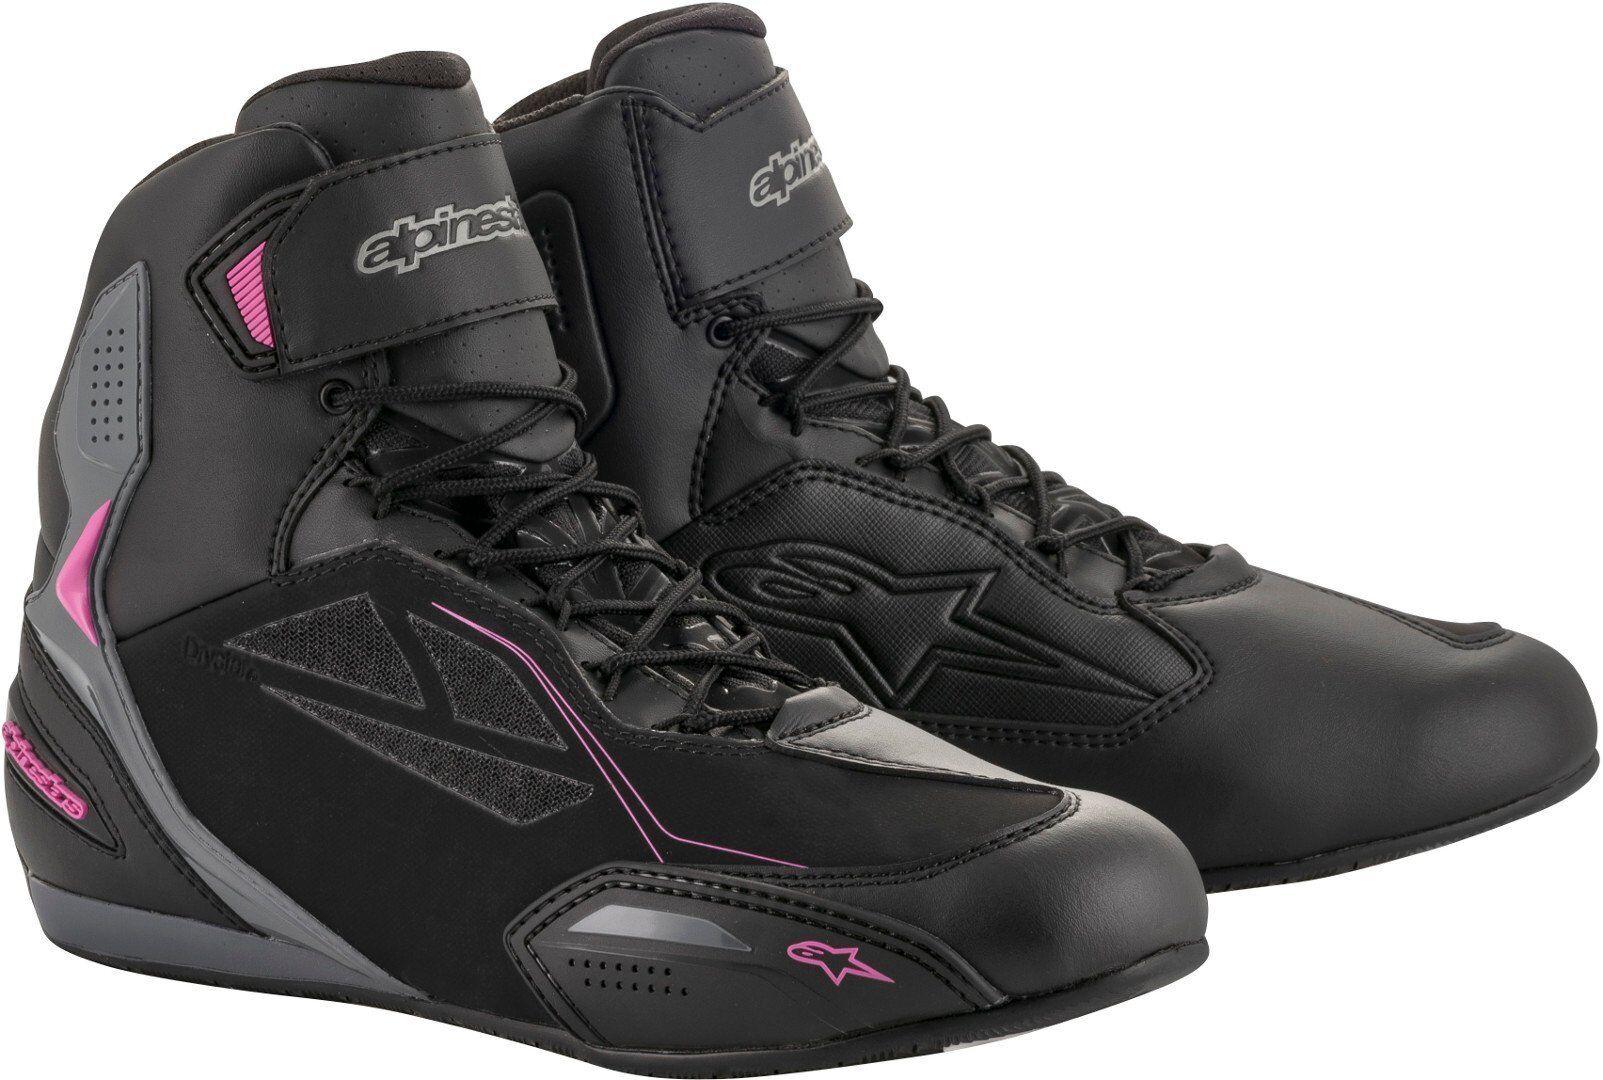 Alpinestars Stella Faster-3 Drystar Ladies Motorcycle Shoes Black Grey Pink 42 43